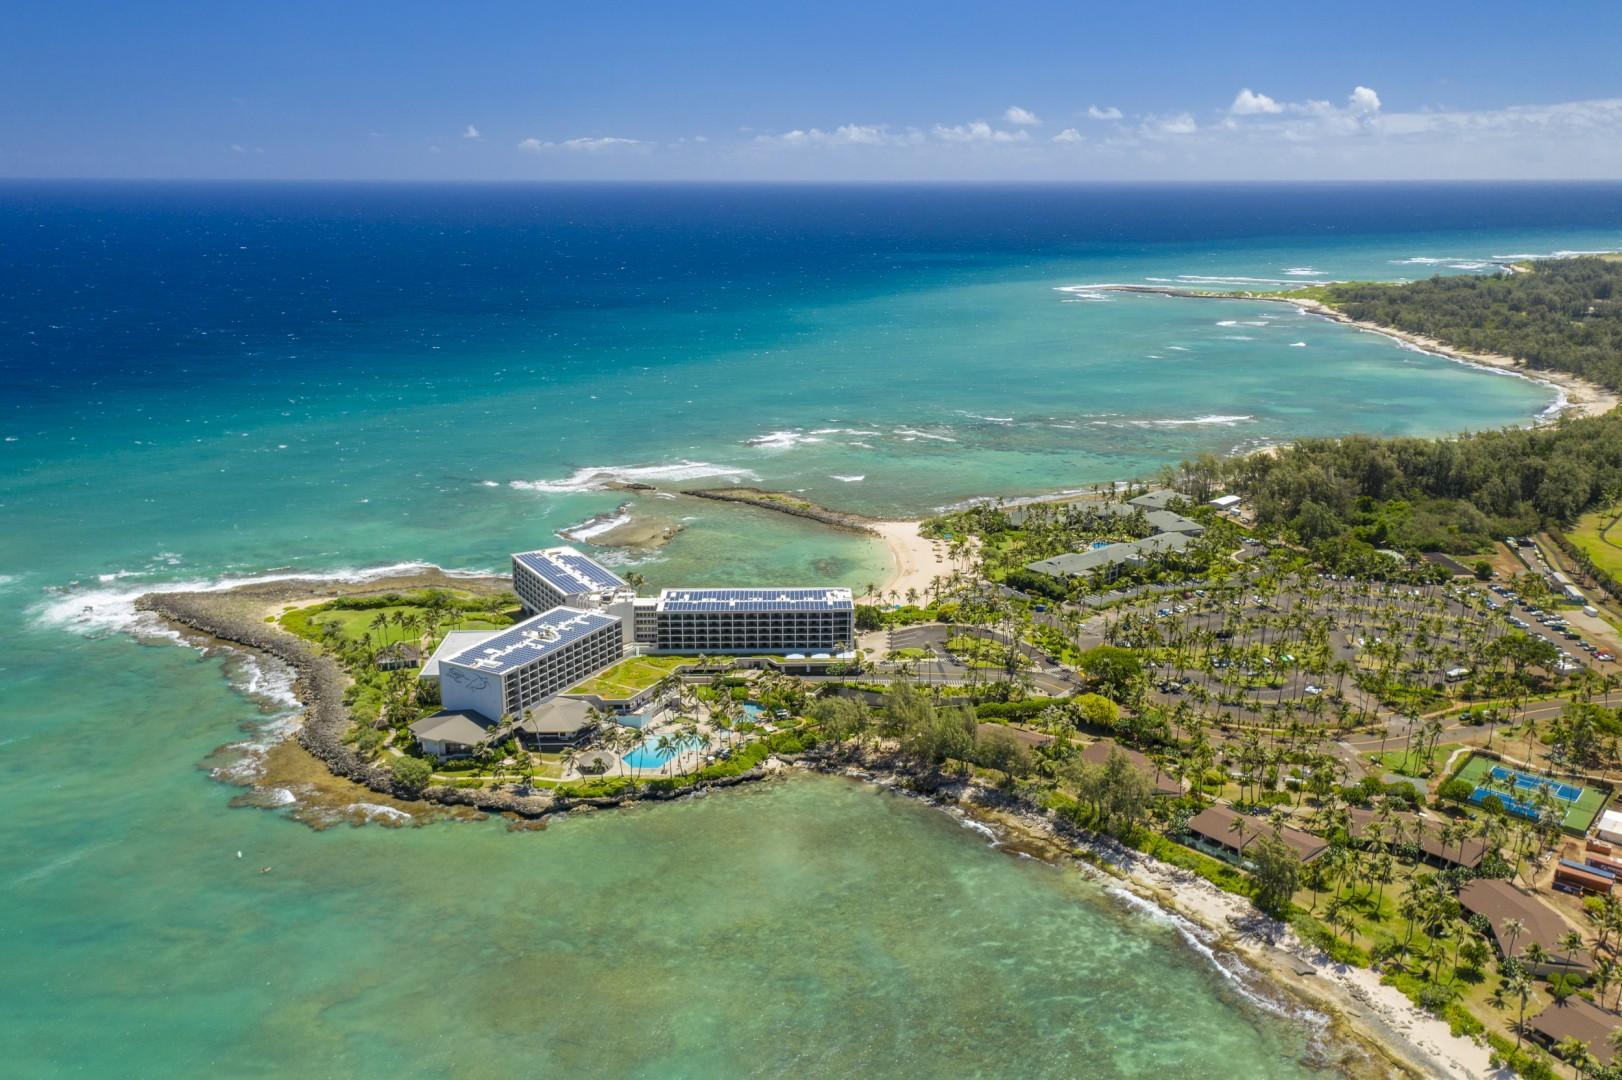 Turtle Bay Resort aerial view